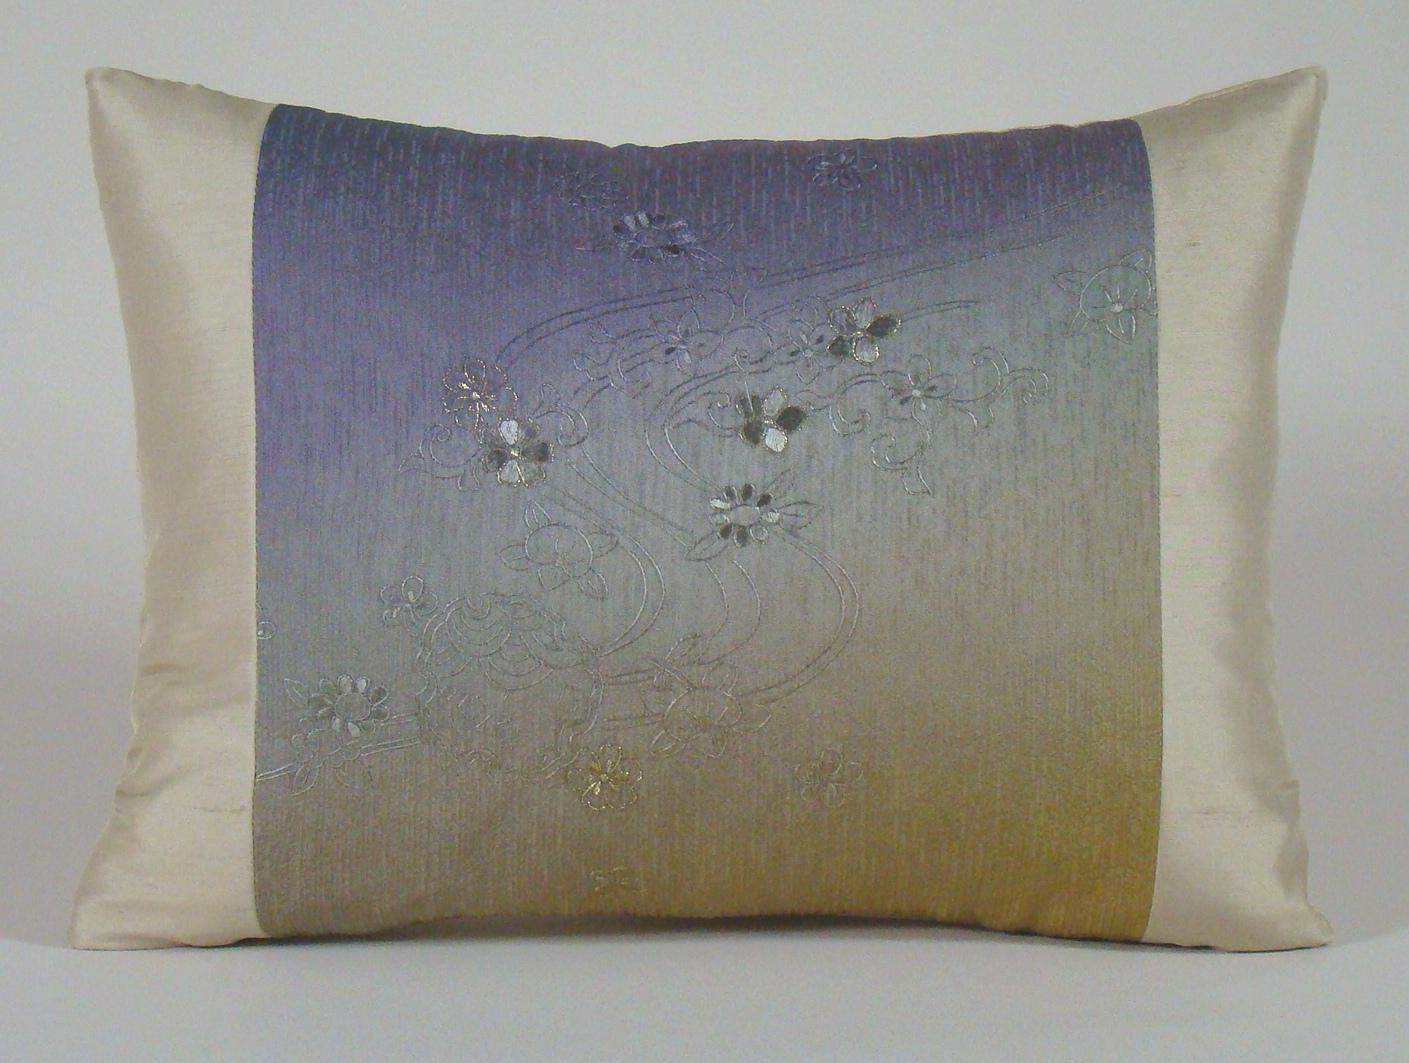 Black Fans /& Cherry Blossoms Japanese Kimono Fabric Pillow Cover 14 x 20